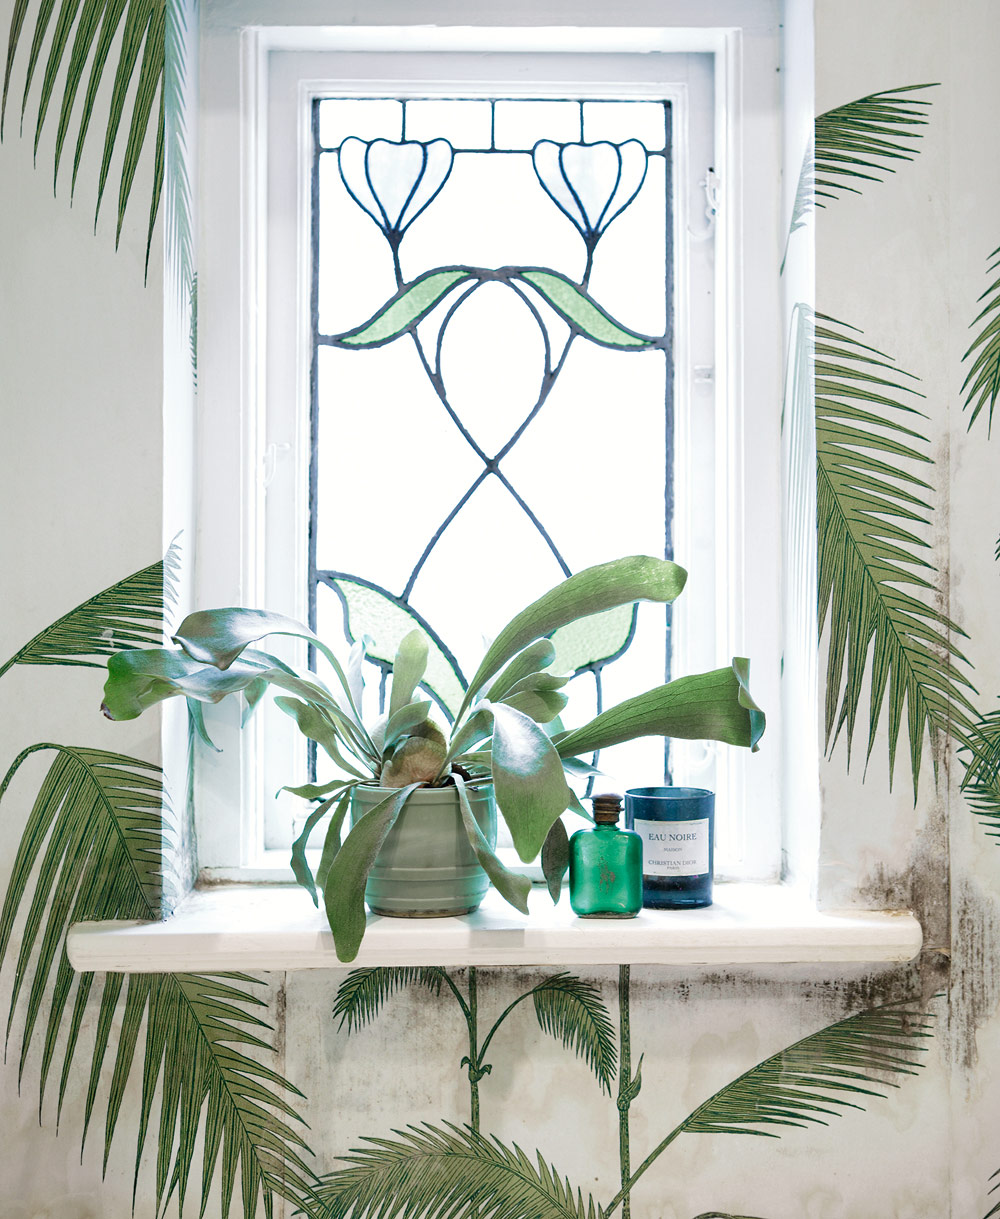 Art-nouveau-window-with-decor-below-From-Skona-Hem-Magazine-Cole-Son-palm-wallpaper-wp3003318